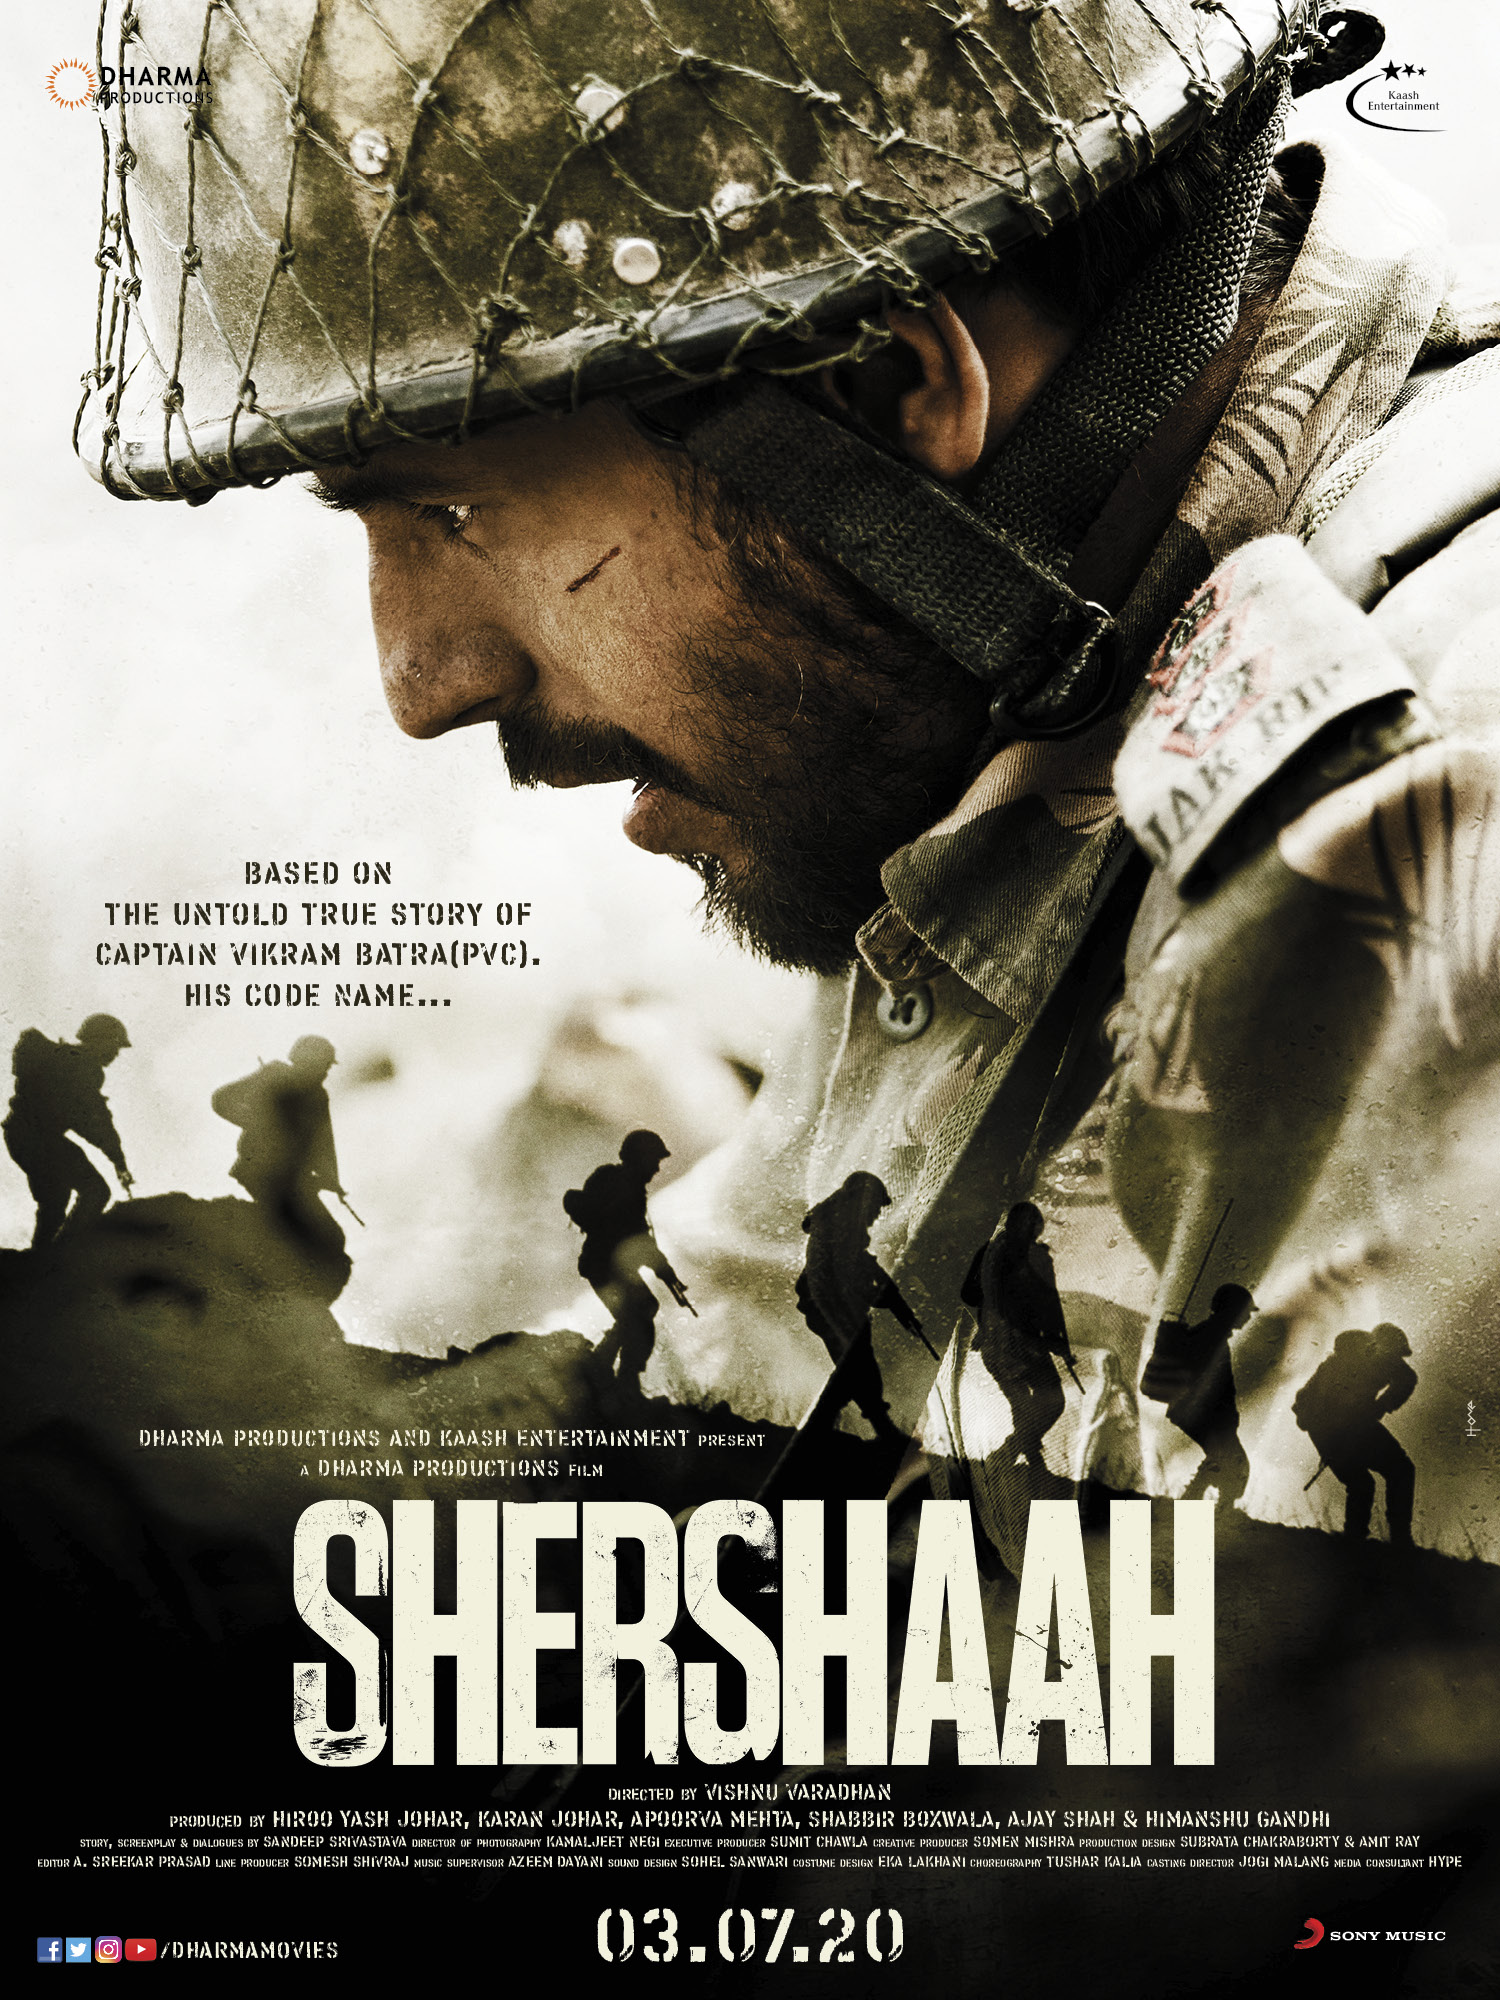 Shershaah: Kargil War Film starring Siddharth Malhotra to be released on OTT | Release Date